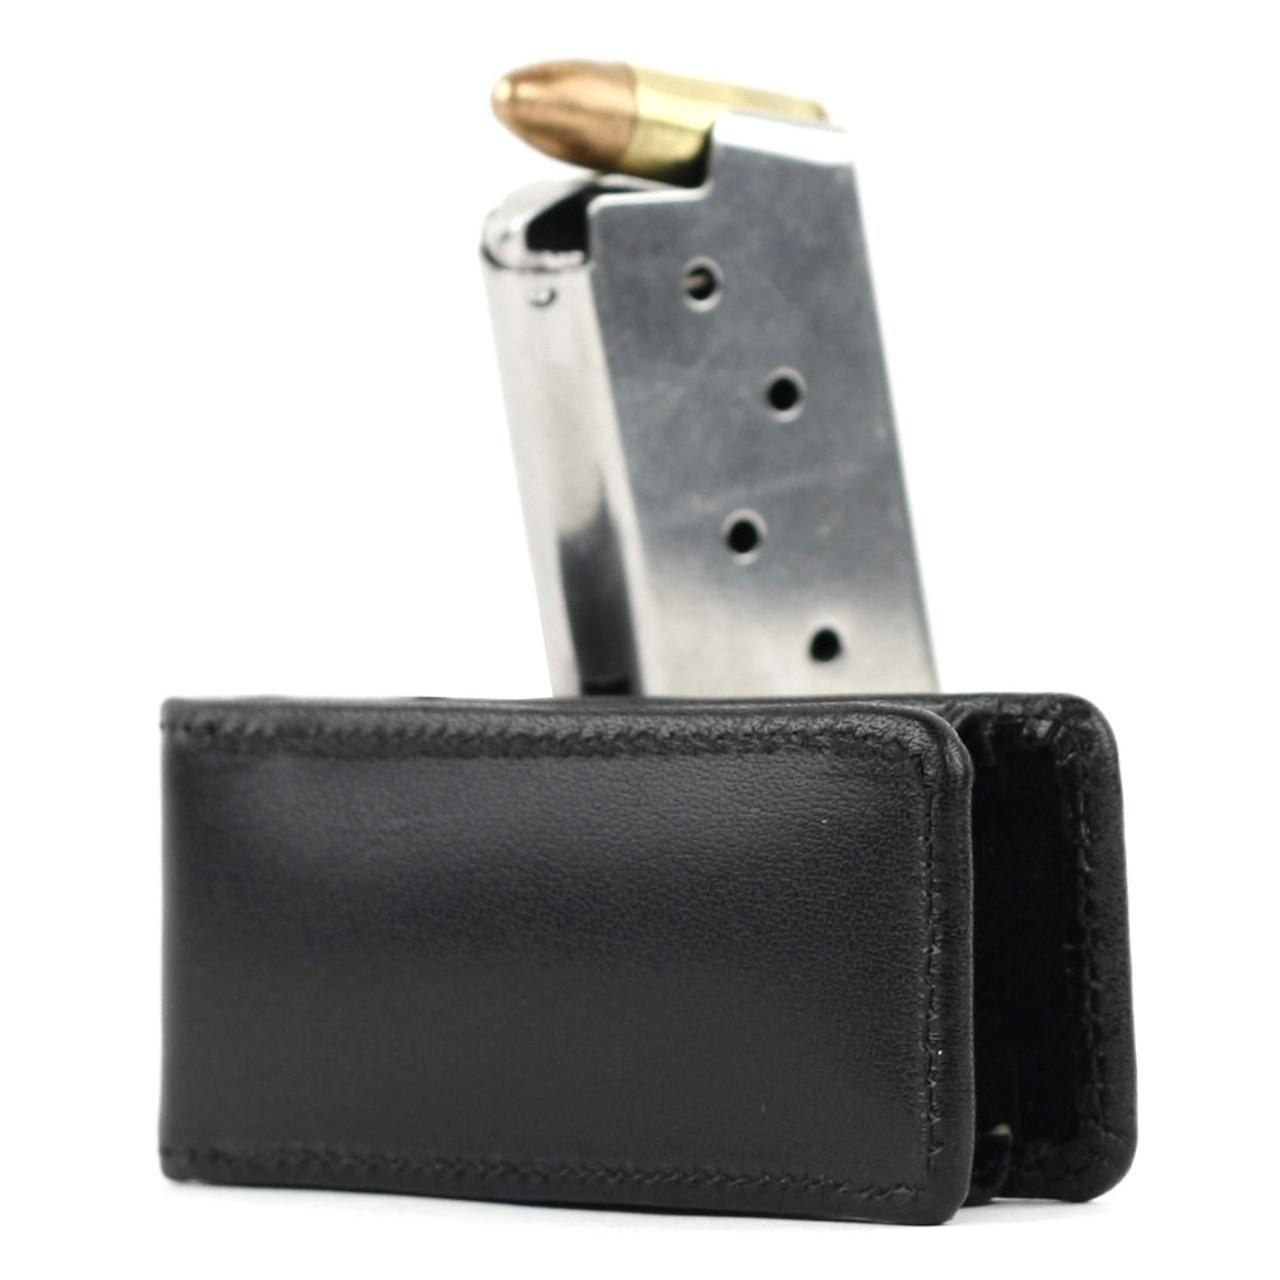 Beretta Nano Magazine Pocket Protector